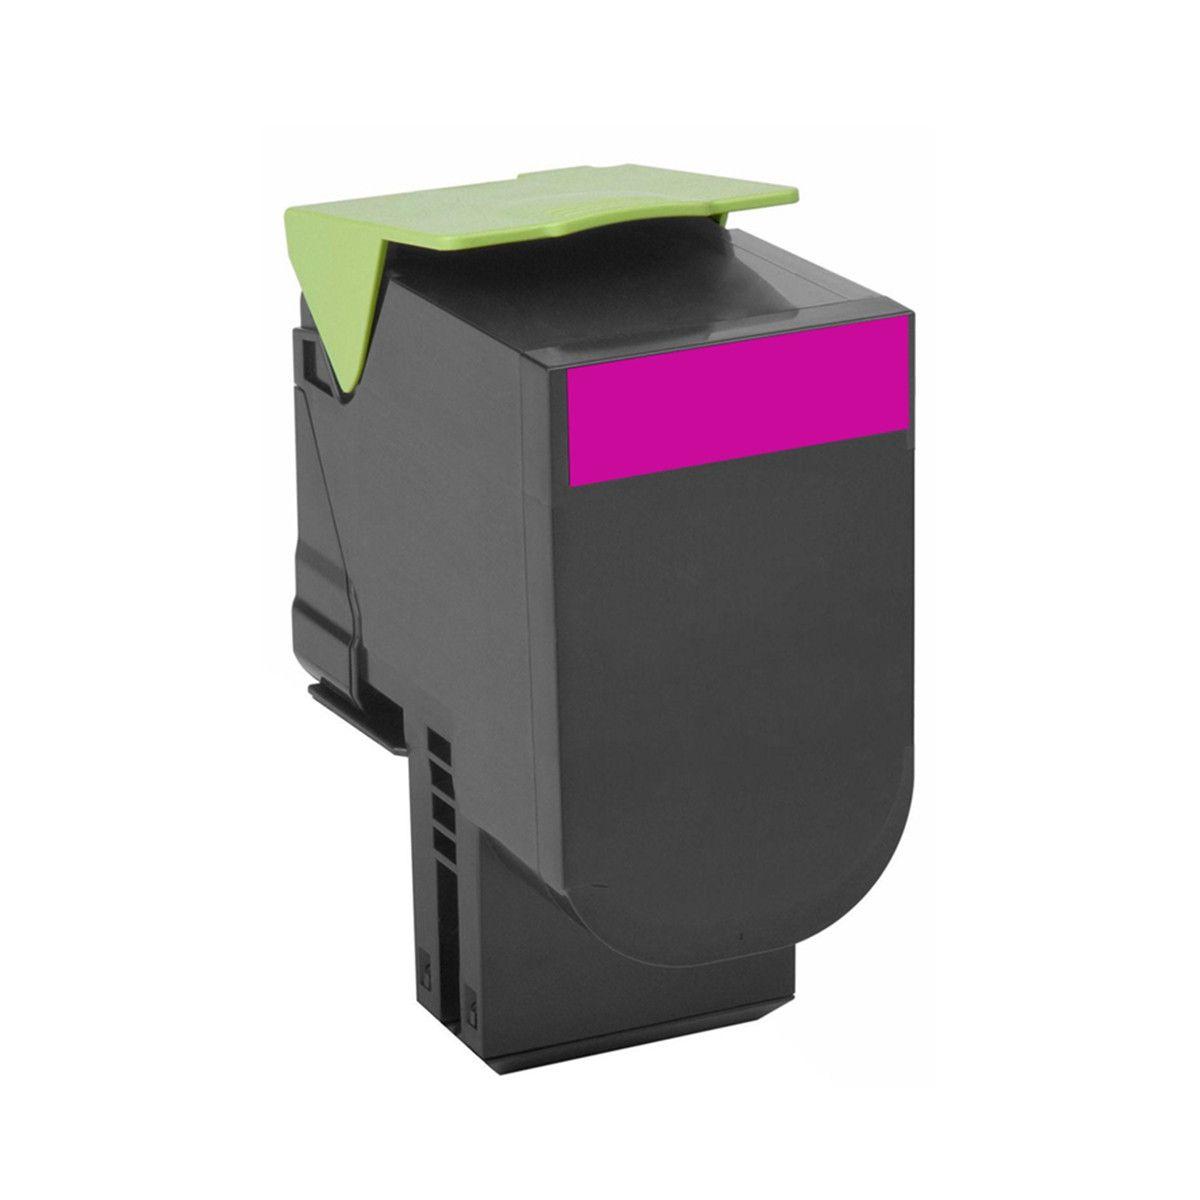 Kit 4 Toners compatíveis Lexmark [70C8HK0] CS310dn CS410 CS510 4k e 3k Black, Ciano, Magenta e Yellow